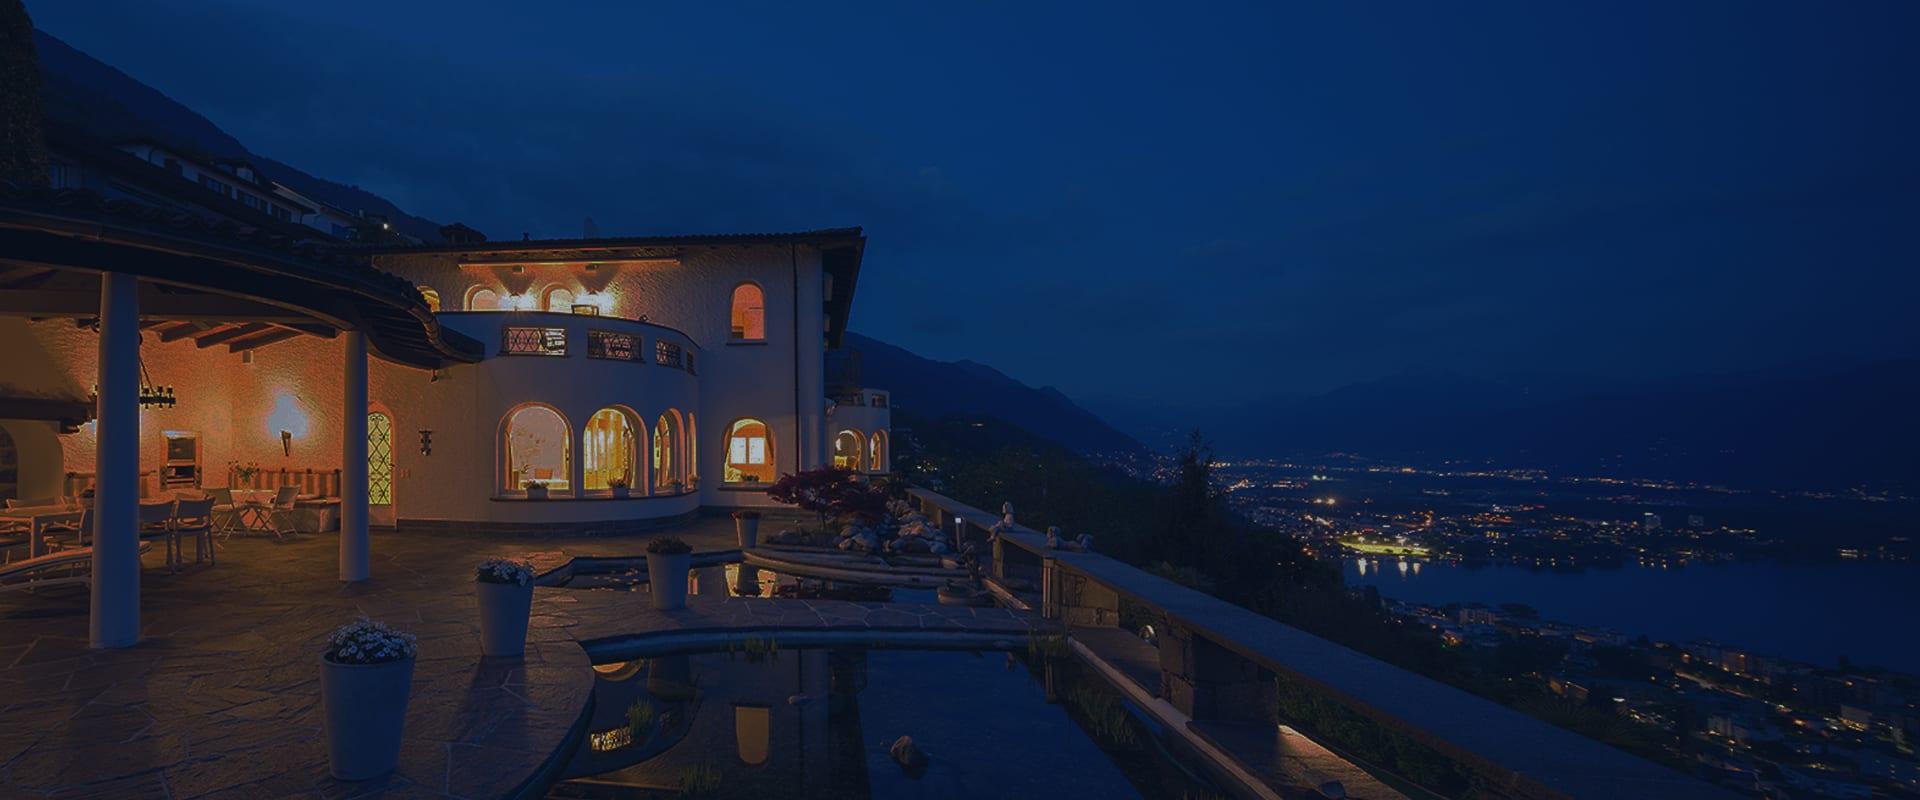 Luxury-Home-at-Night-8